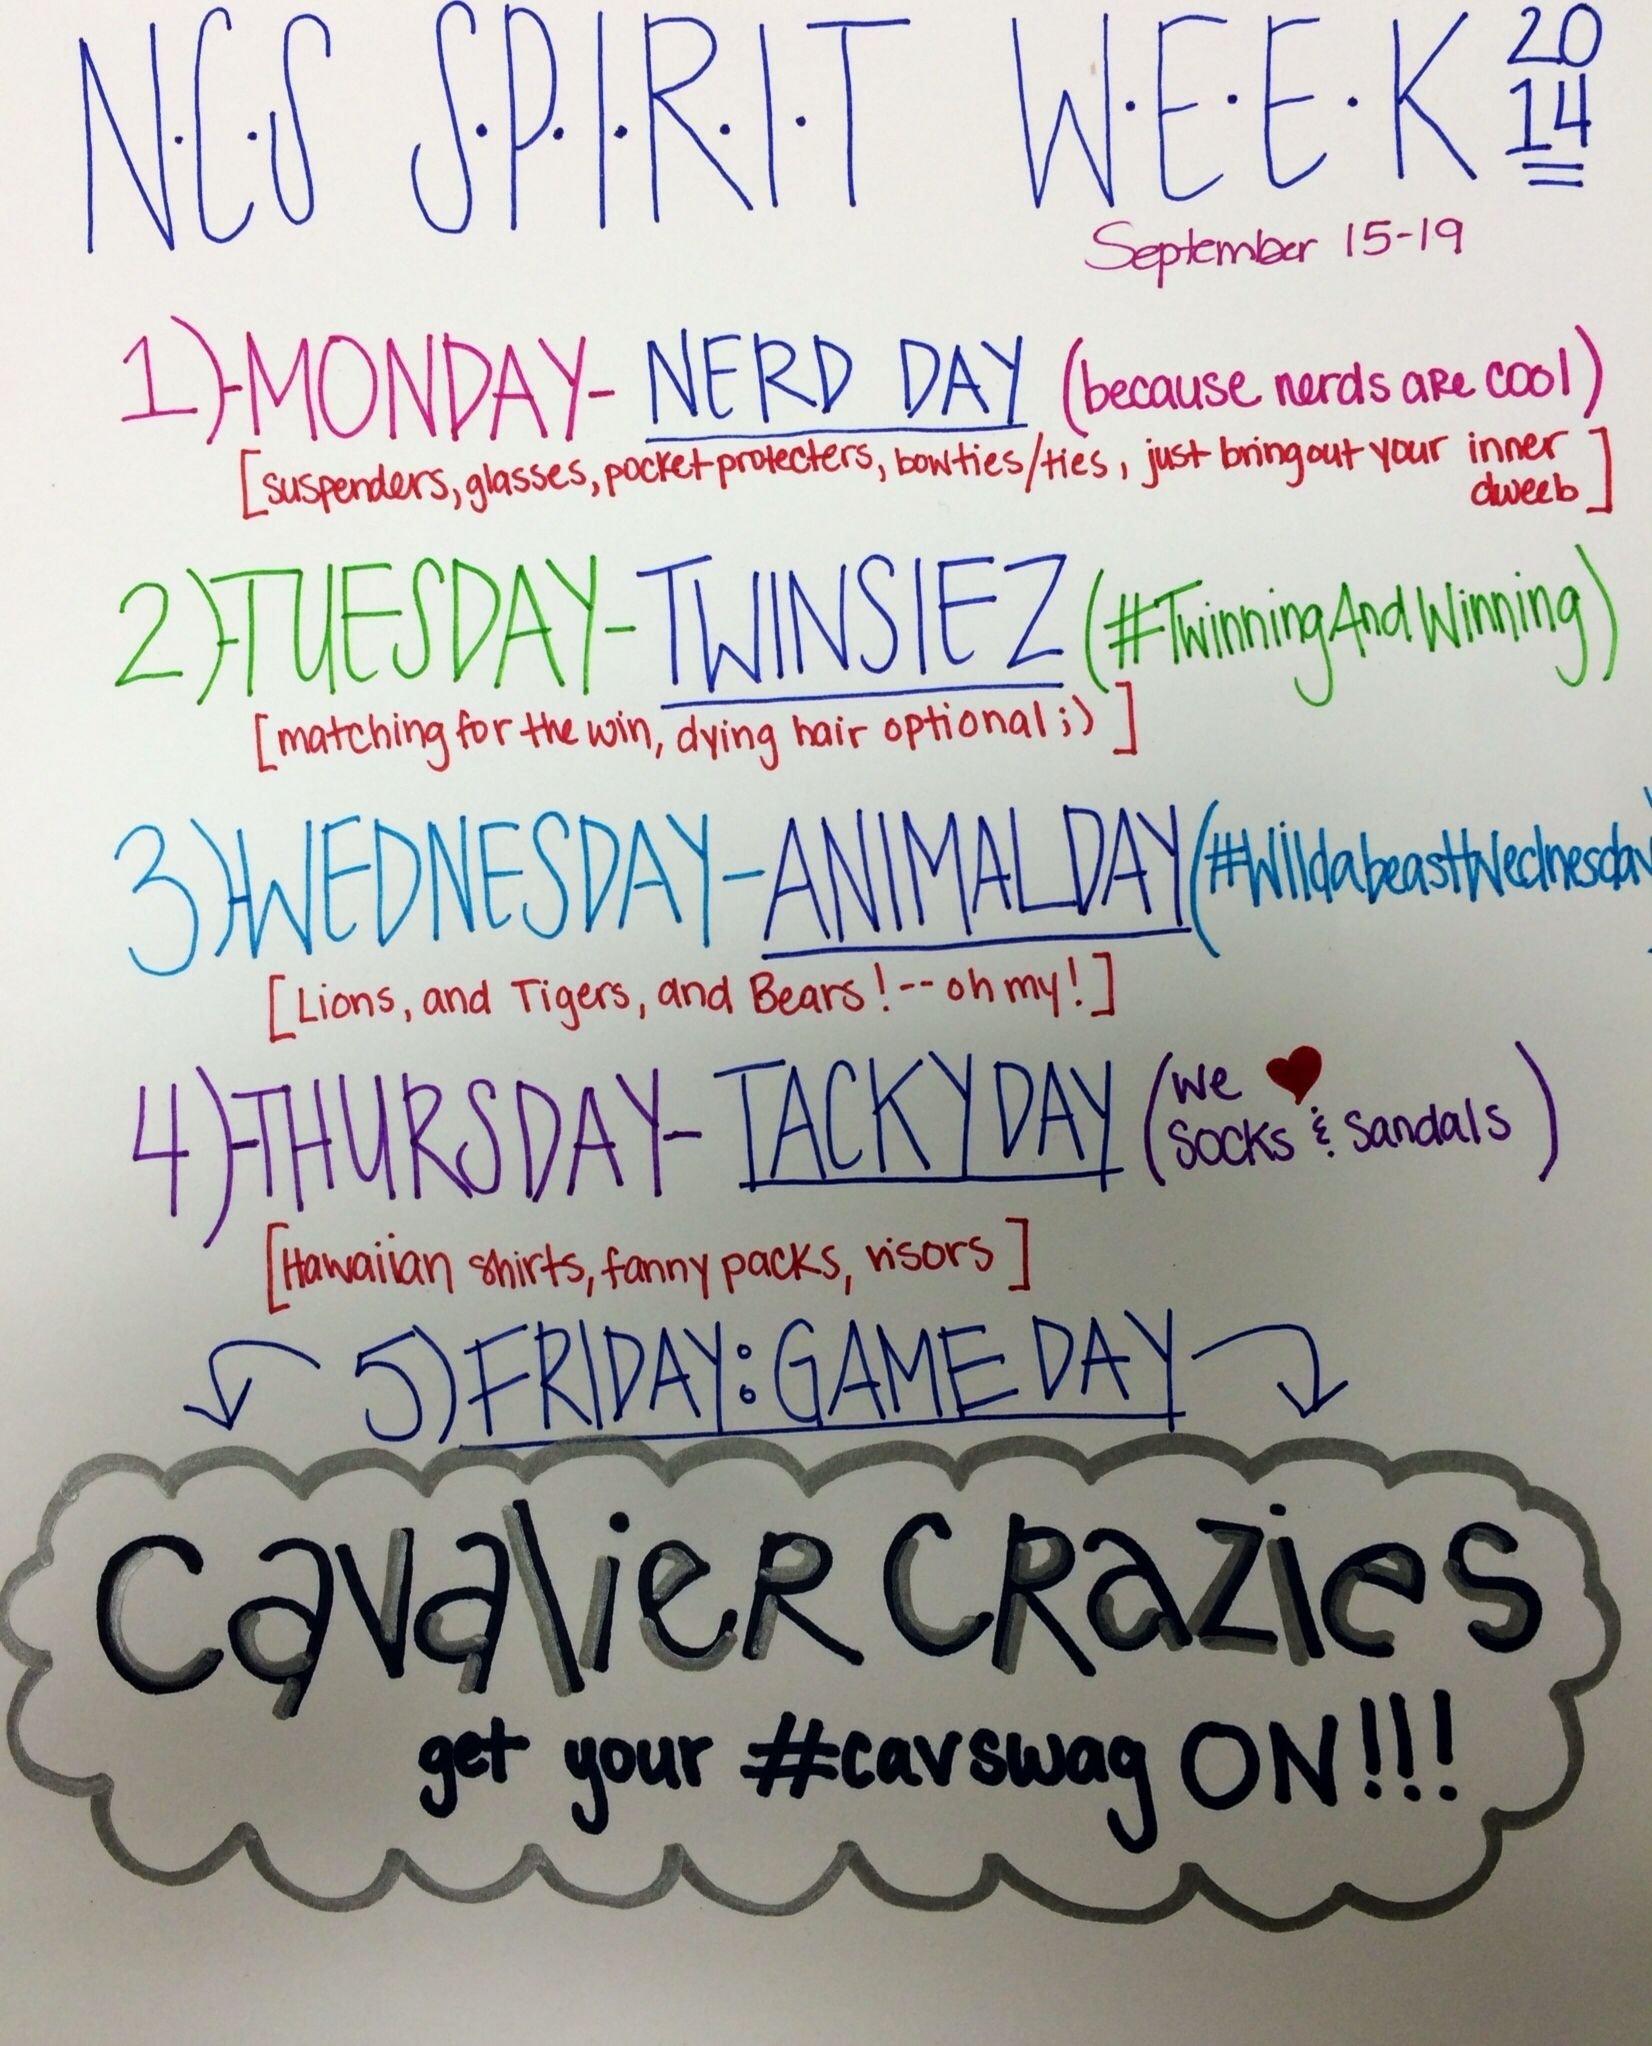 10 Most Recommended Spirit Week Ideas For Elementary School image result for spirit week ideas spirit week pinterest 1 2020